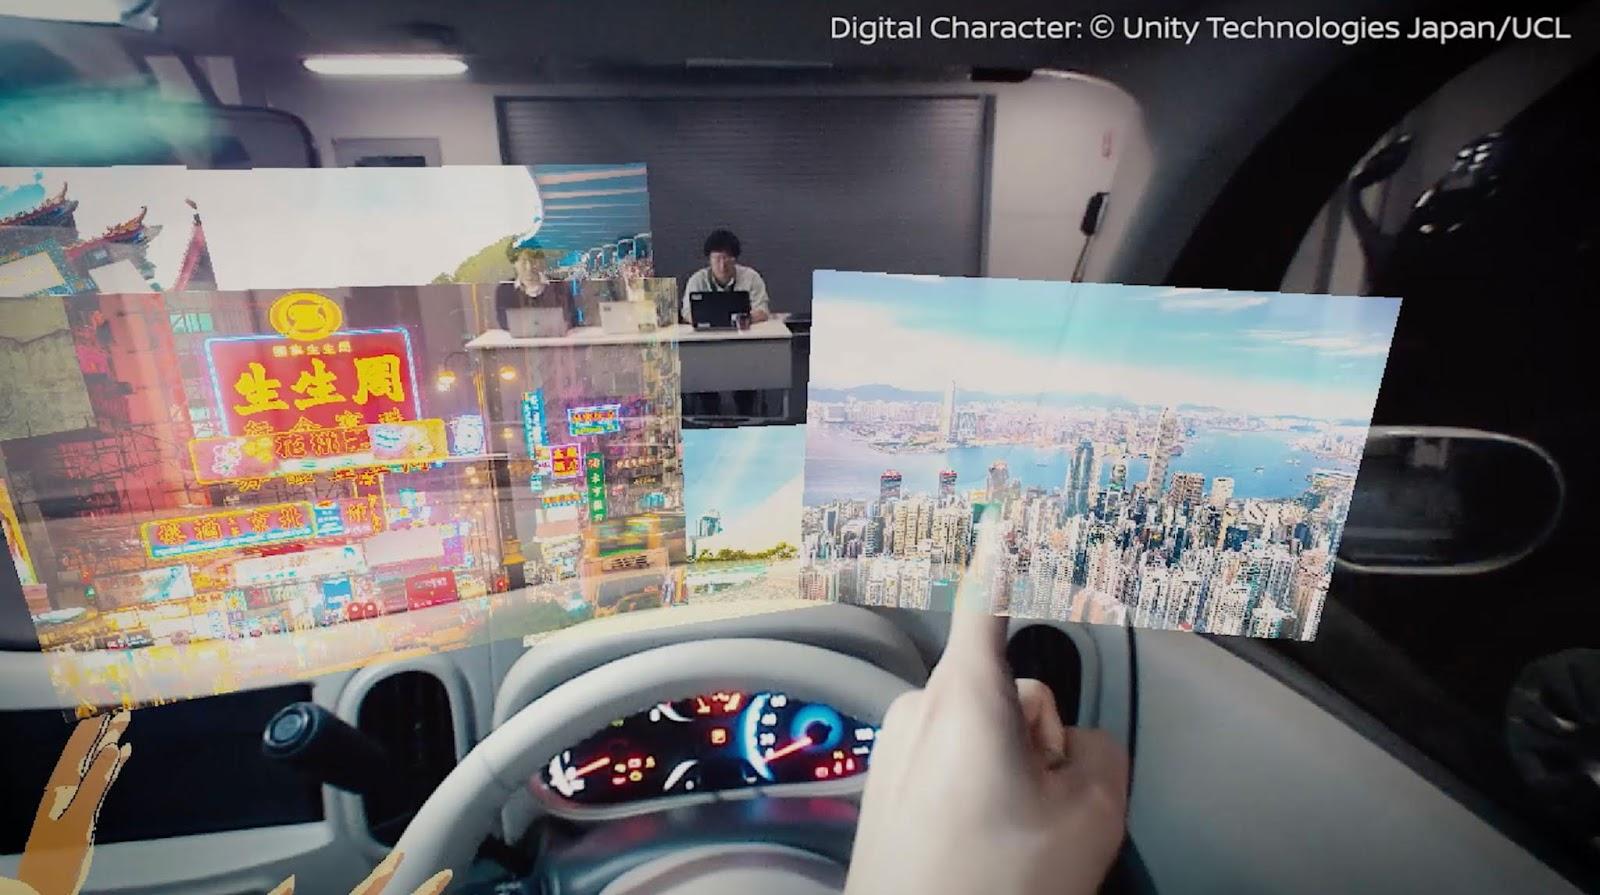 NISSAN I2V 1 Η Nissan σχεδιάζει augmented reality για τα μοντέλα της Nissan, zblog, τεχνικά, Τεχνολογία